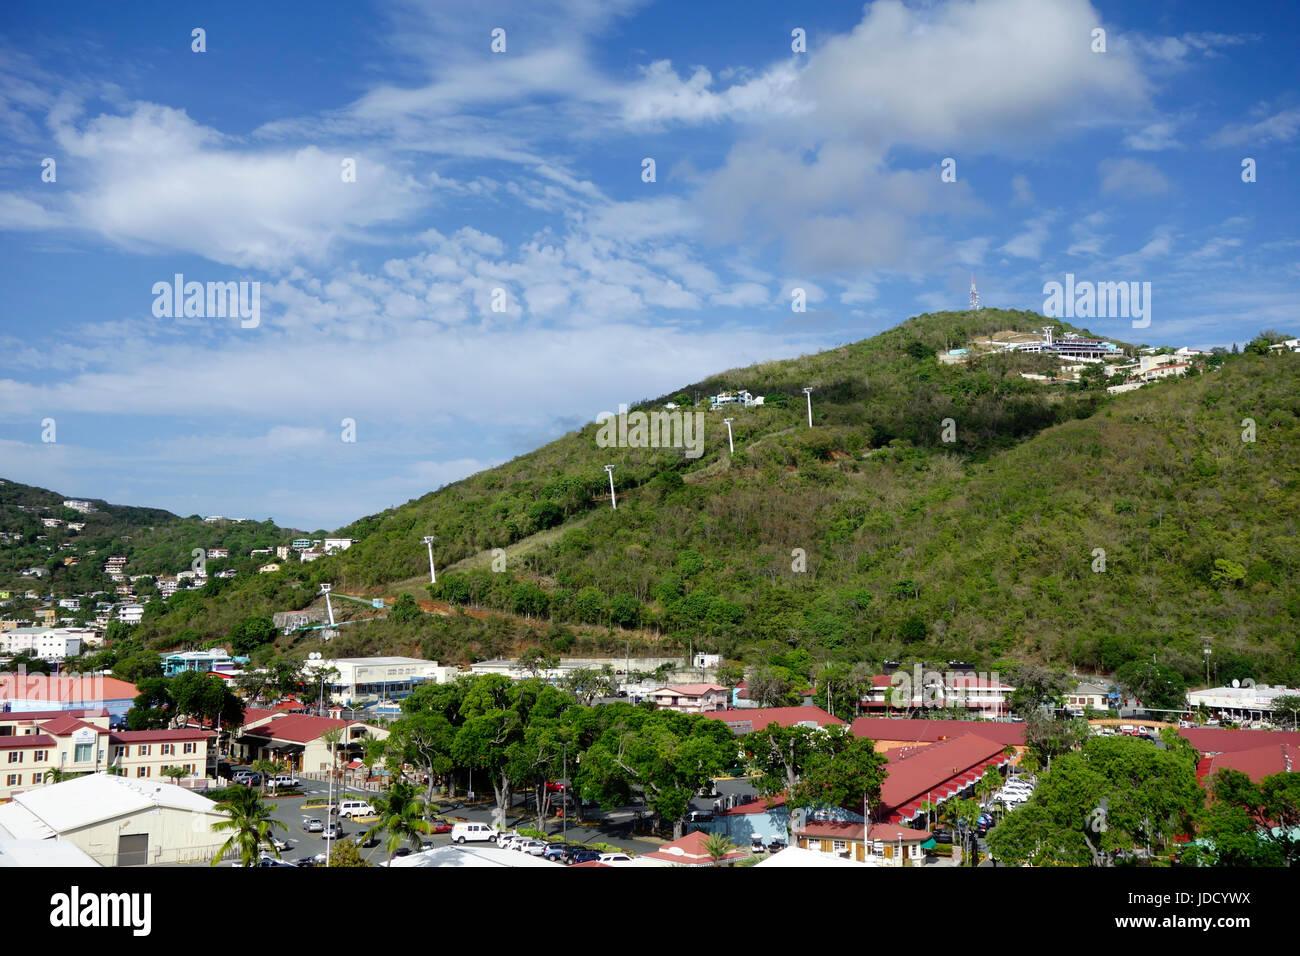 Cable car seen from cruise port at Charlotte Amalie, St Thomas, Caribbean, St. Thomas, USVI. Stock Photo